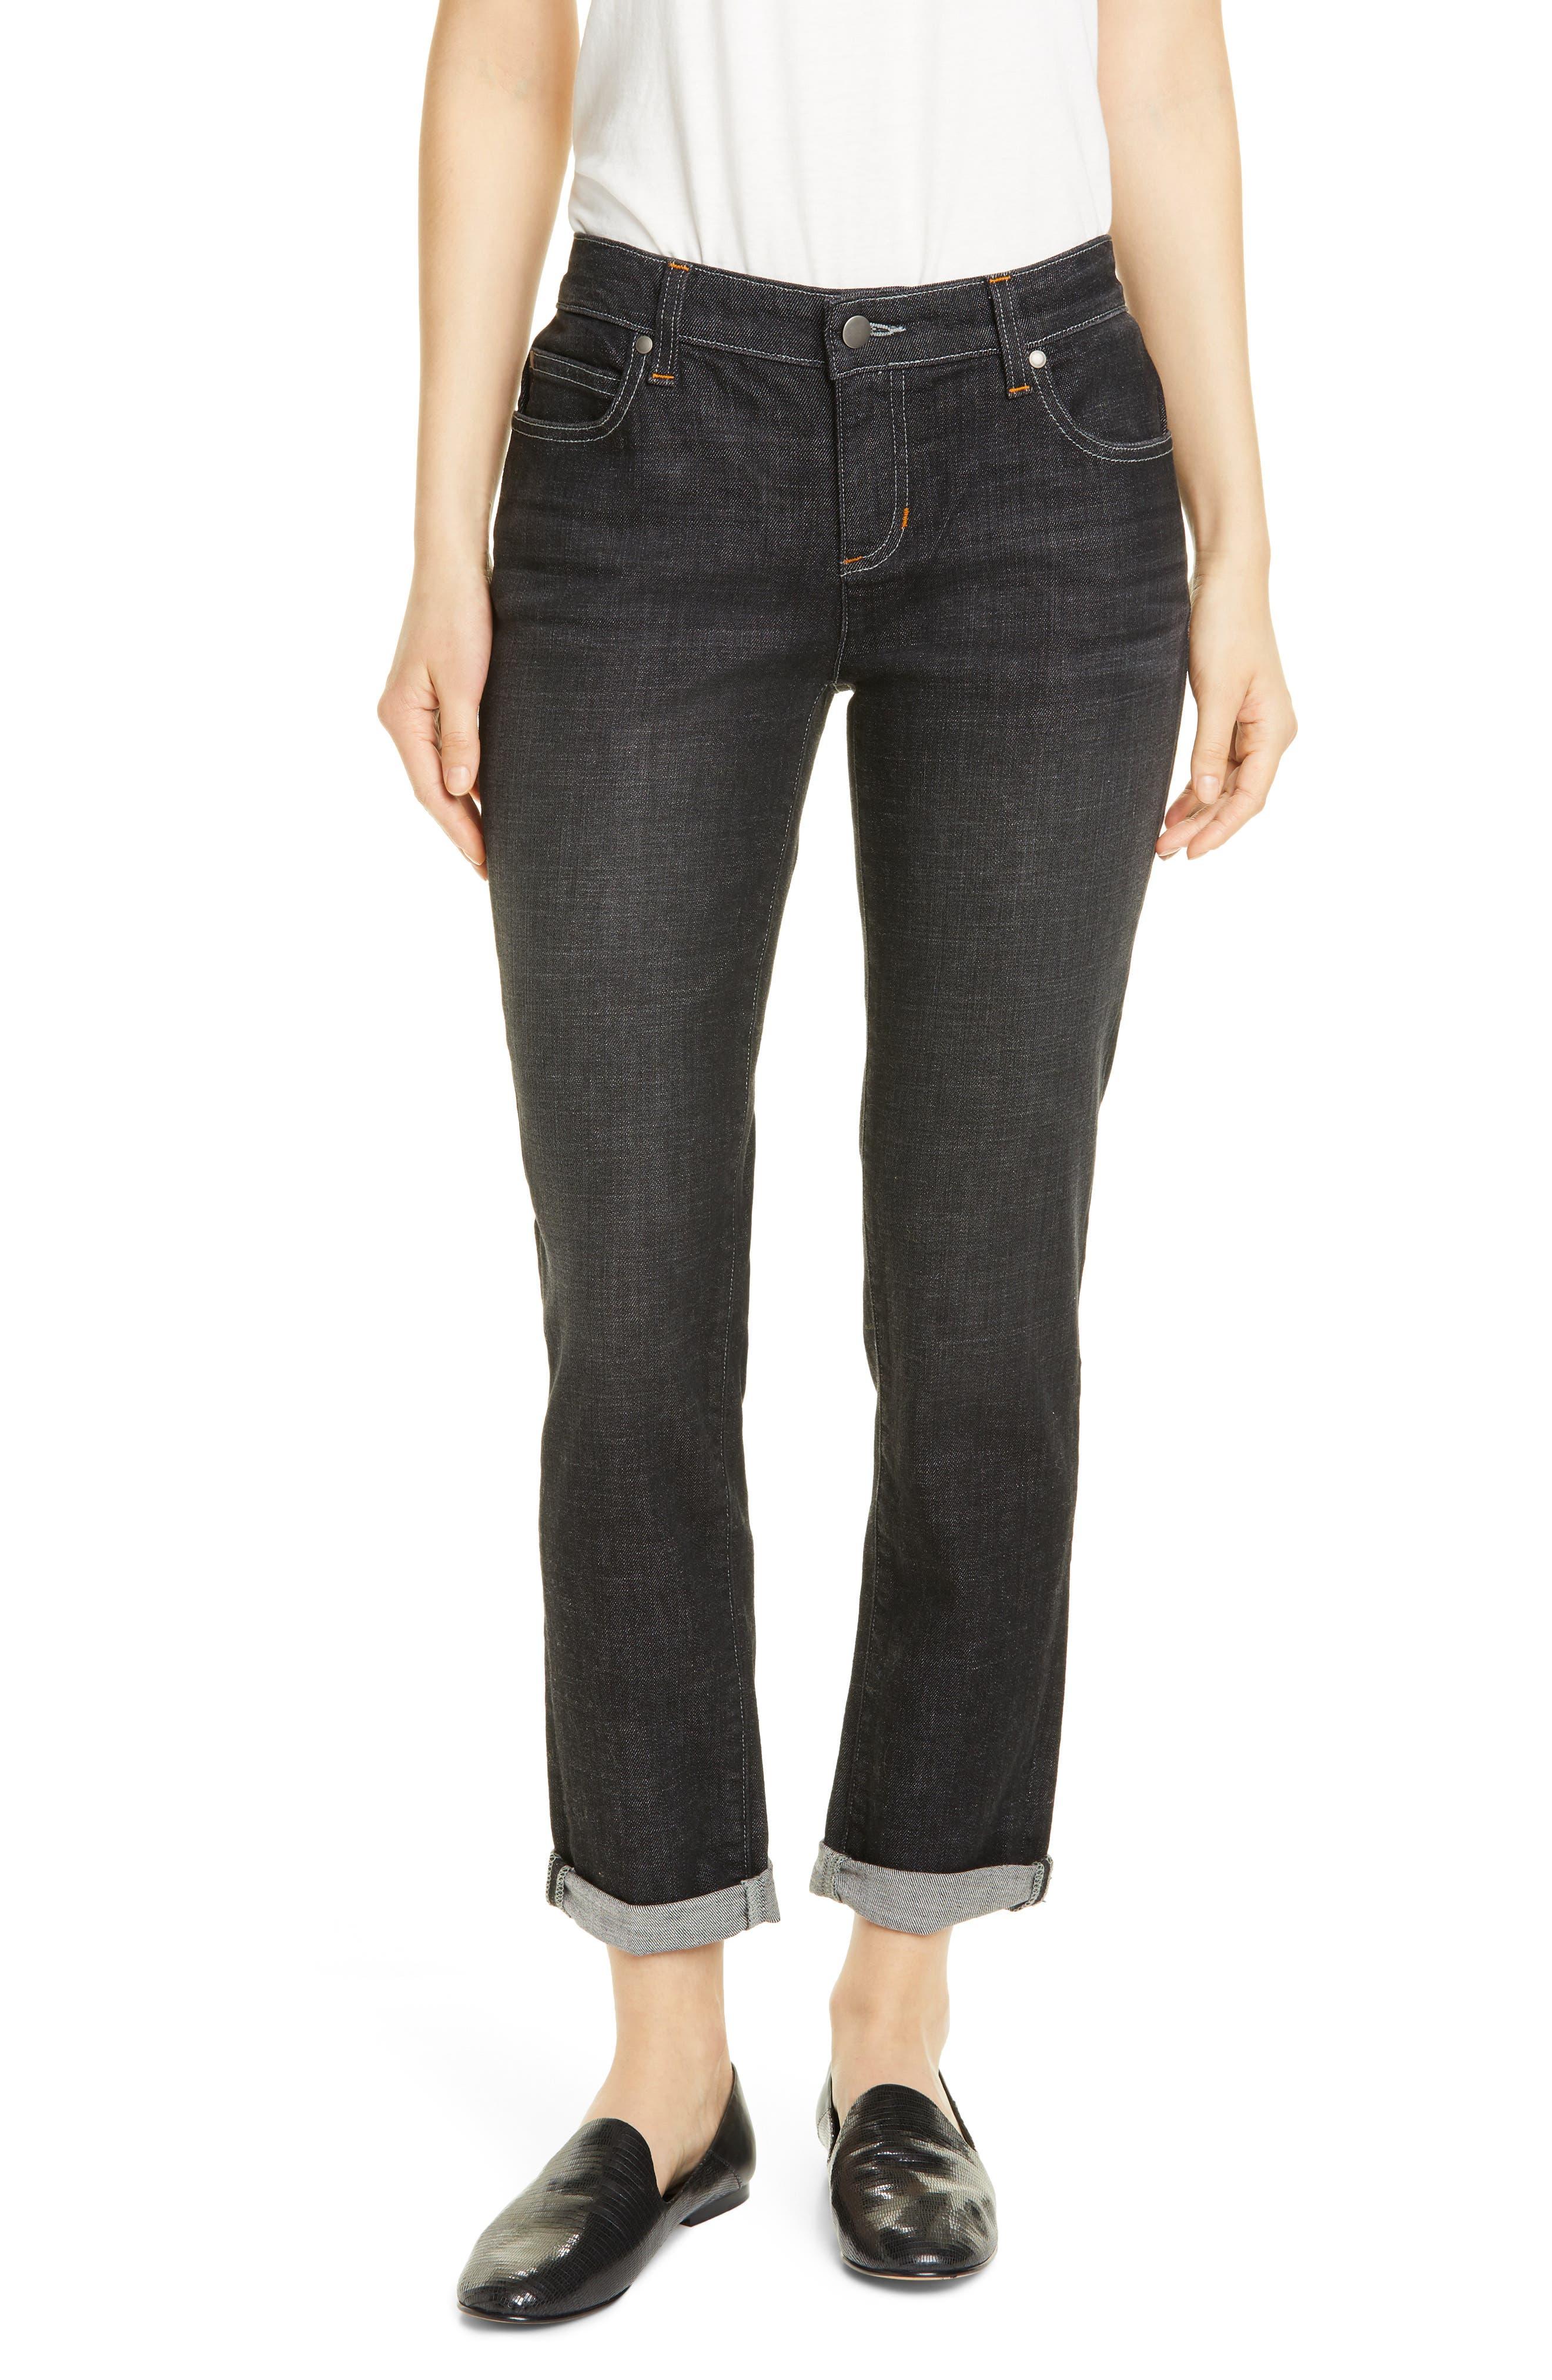 Eileen Fisher Boyfriend Jeans (Regular & Petite)